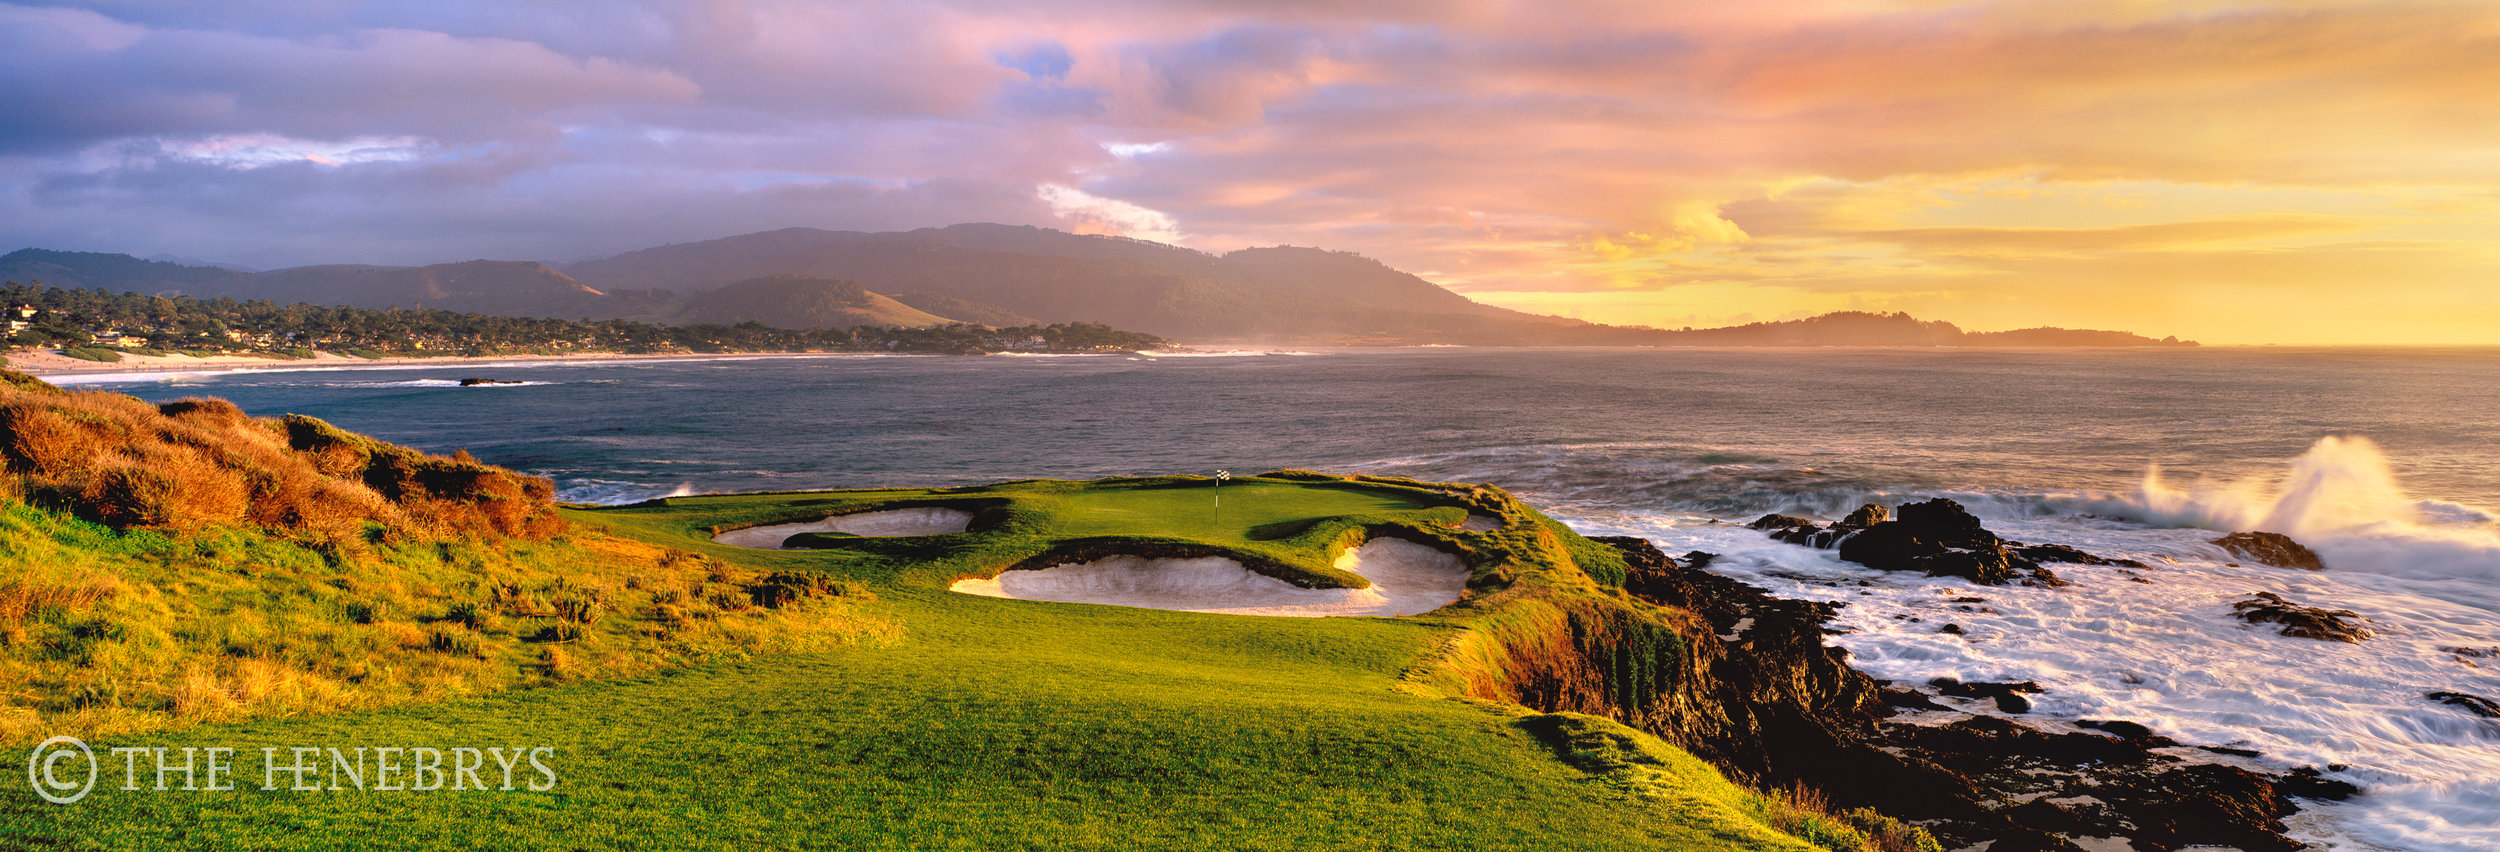 "Pebble Beach Golf Links® #07 ""After The Storm"", Pebble Beach, California"